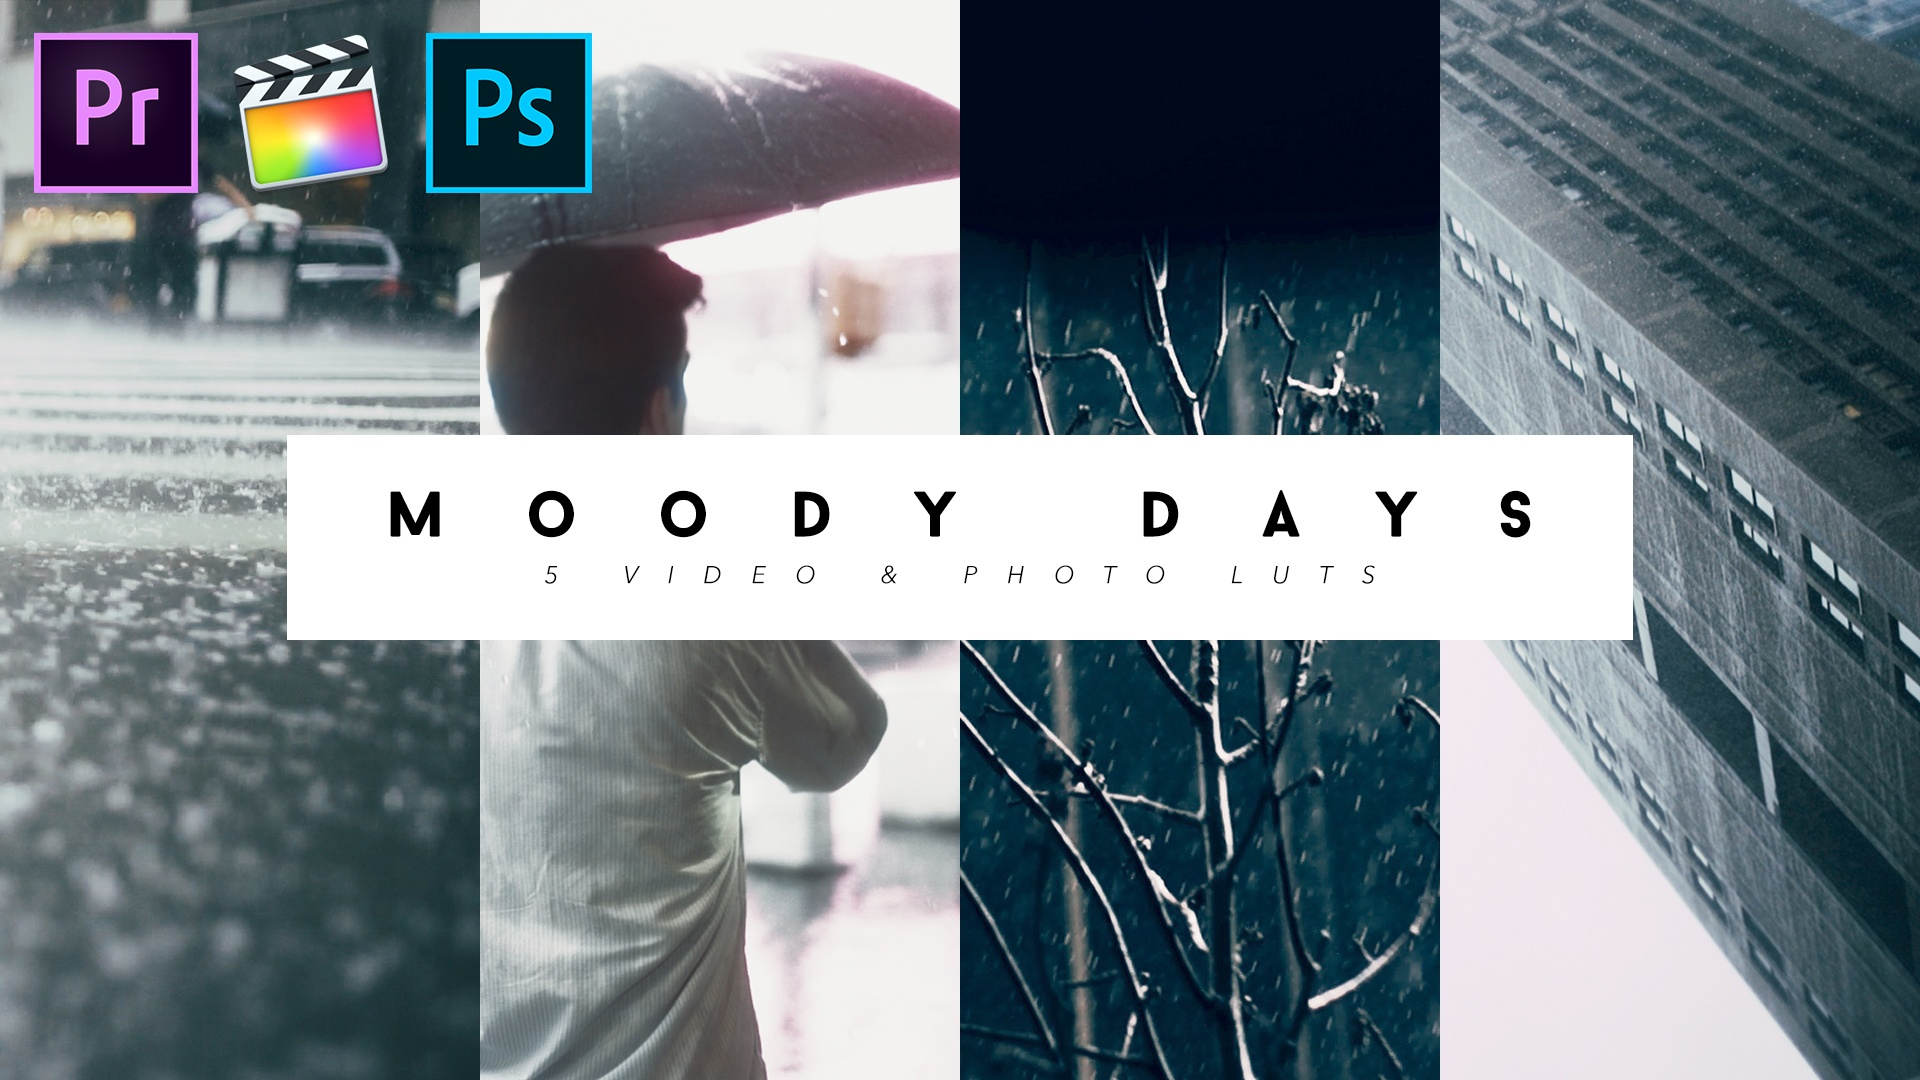 5 LUTS - MOODY DAYS / JONAH PLANK